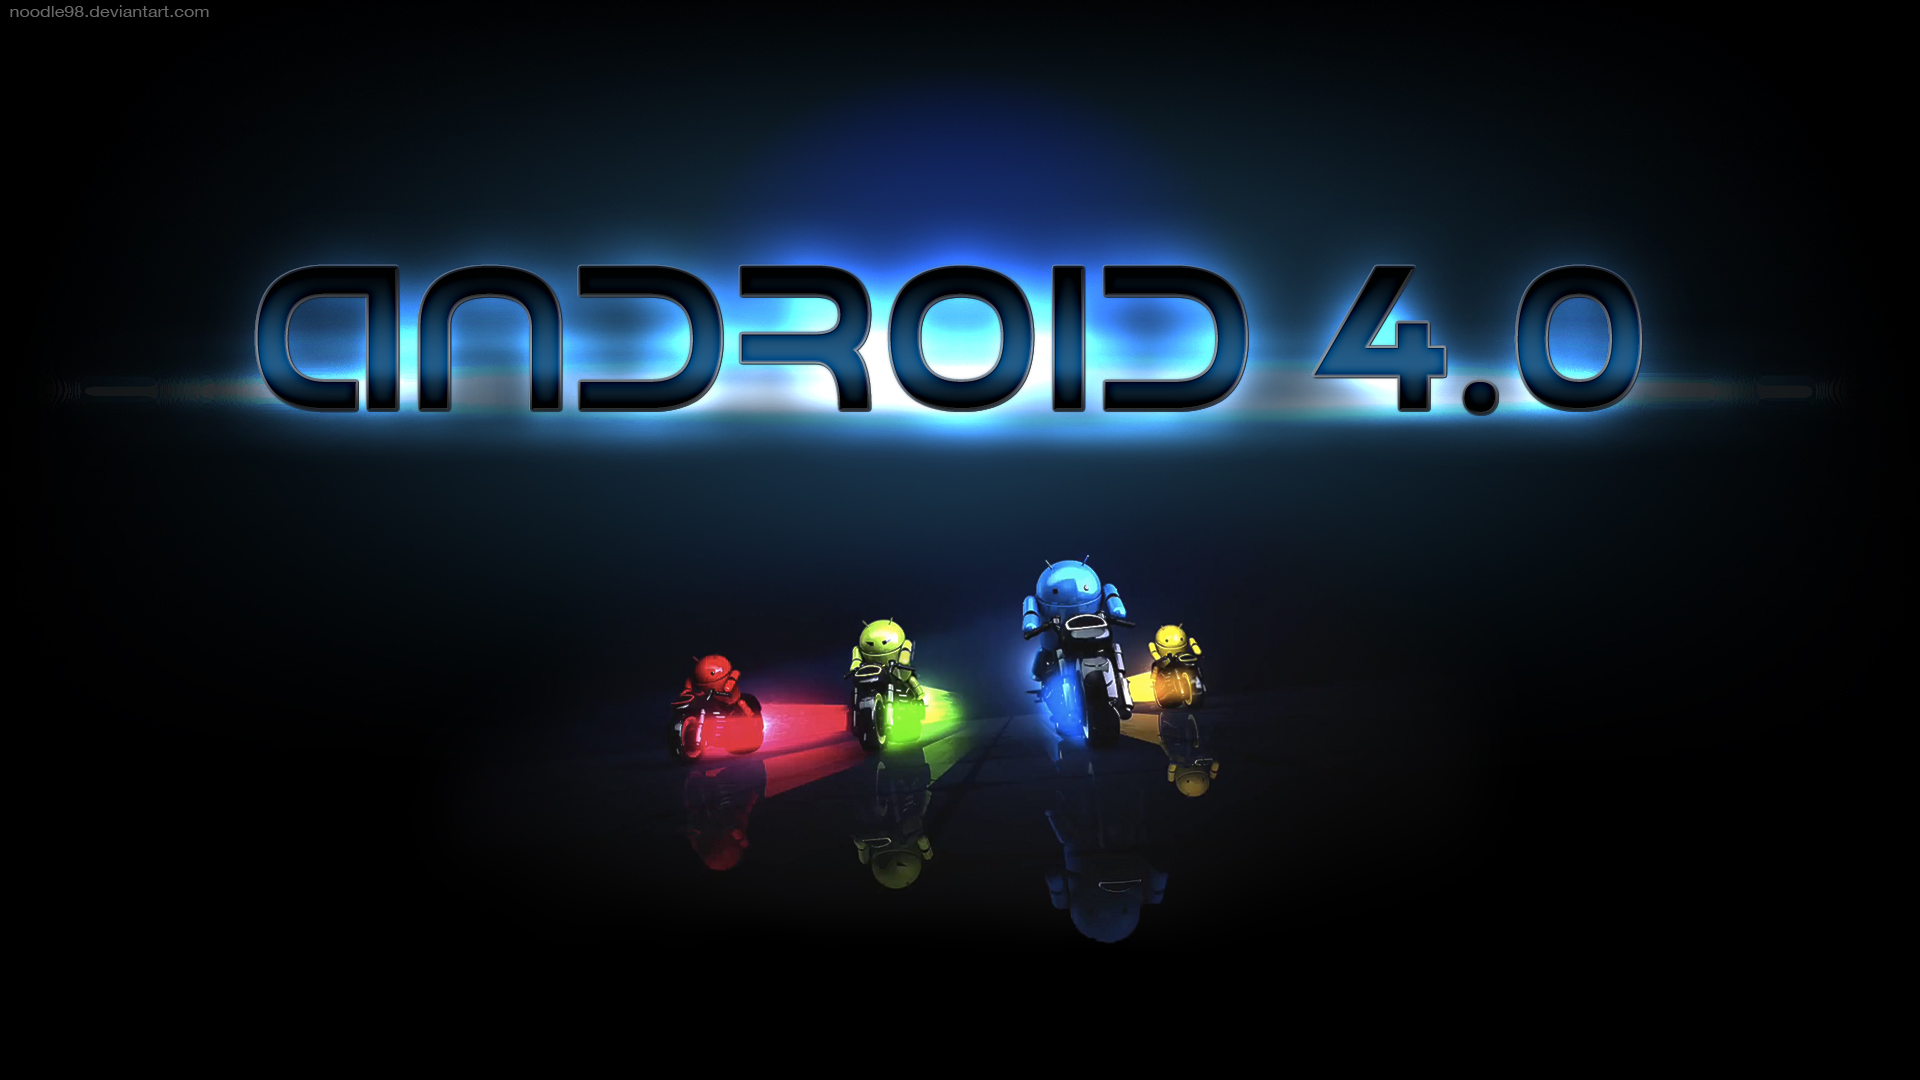 Xperia mini pro sk17i android 404 box with accessories clickbd xperia mini pro sk17i android 404 box with accessories clickbd large image 0 voltagebd Images